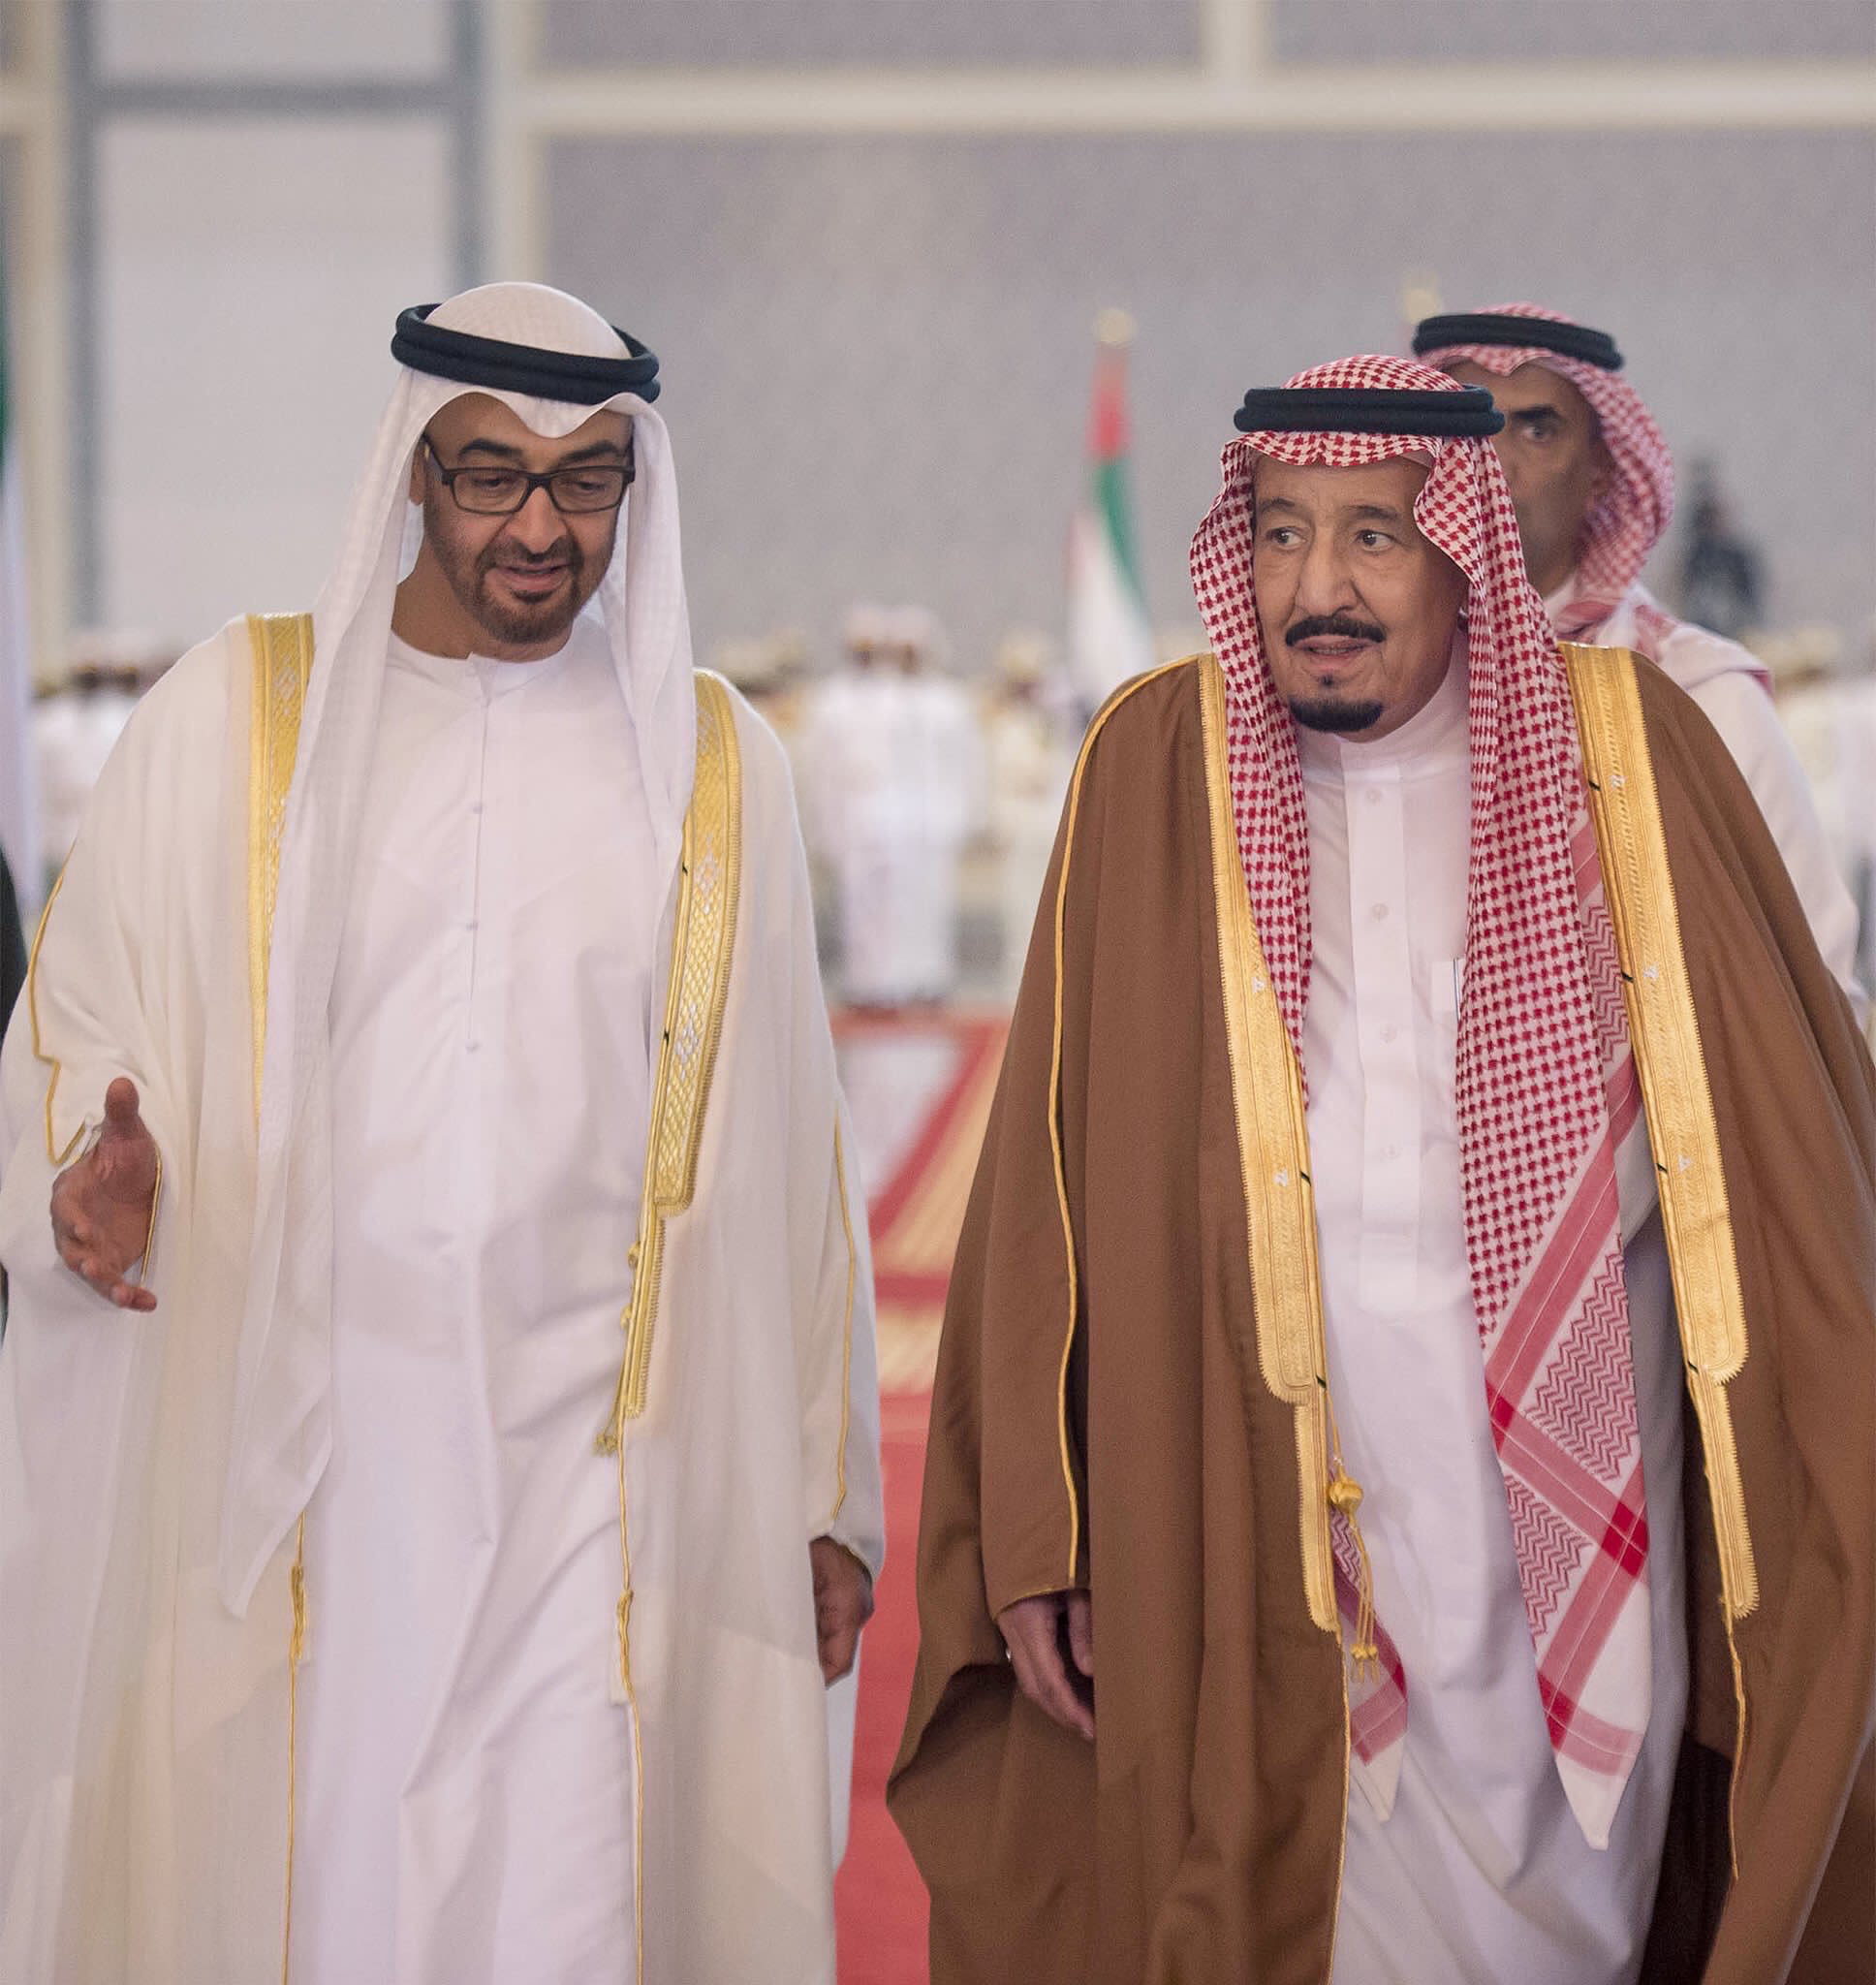 Pin By Al Saada On Zayed Bin Sultan Arab Men Ksa Saudi Arabia King Faisal